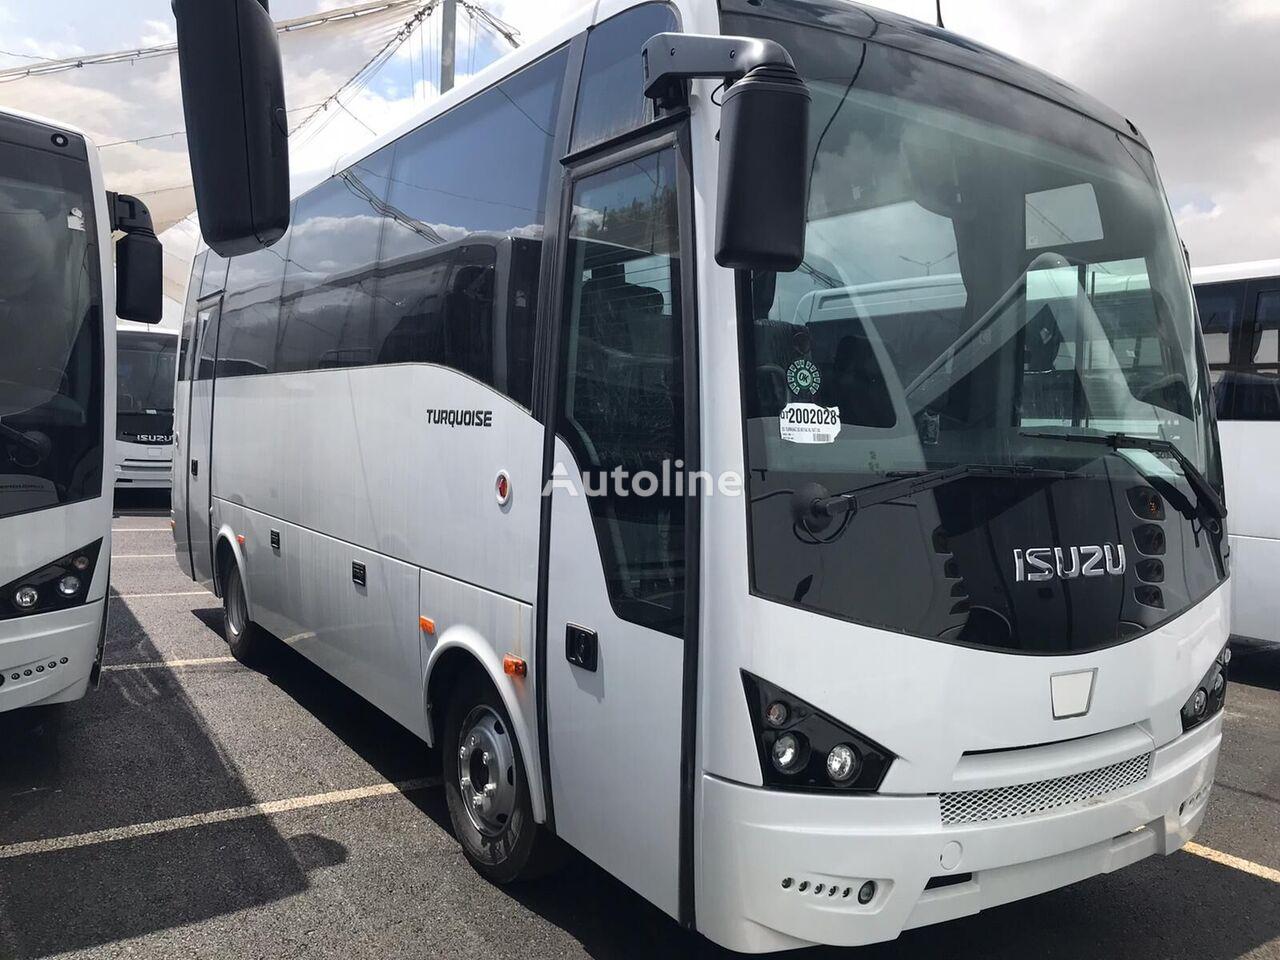 Купить туристический автобус ISUZU Turquoise 3 x Stock Euro 5 ! we ship worldwide !! Германия Gmund am Tegernsee, GU23107